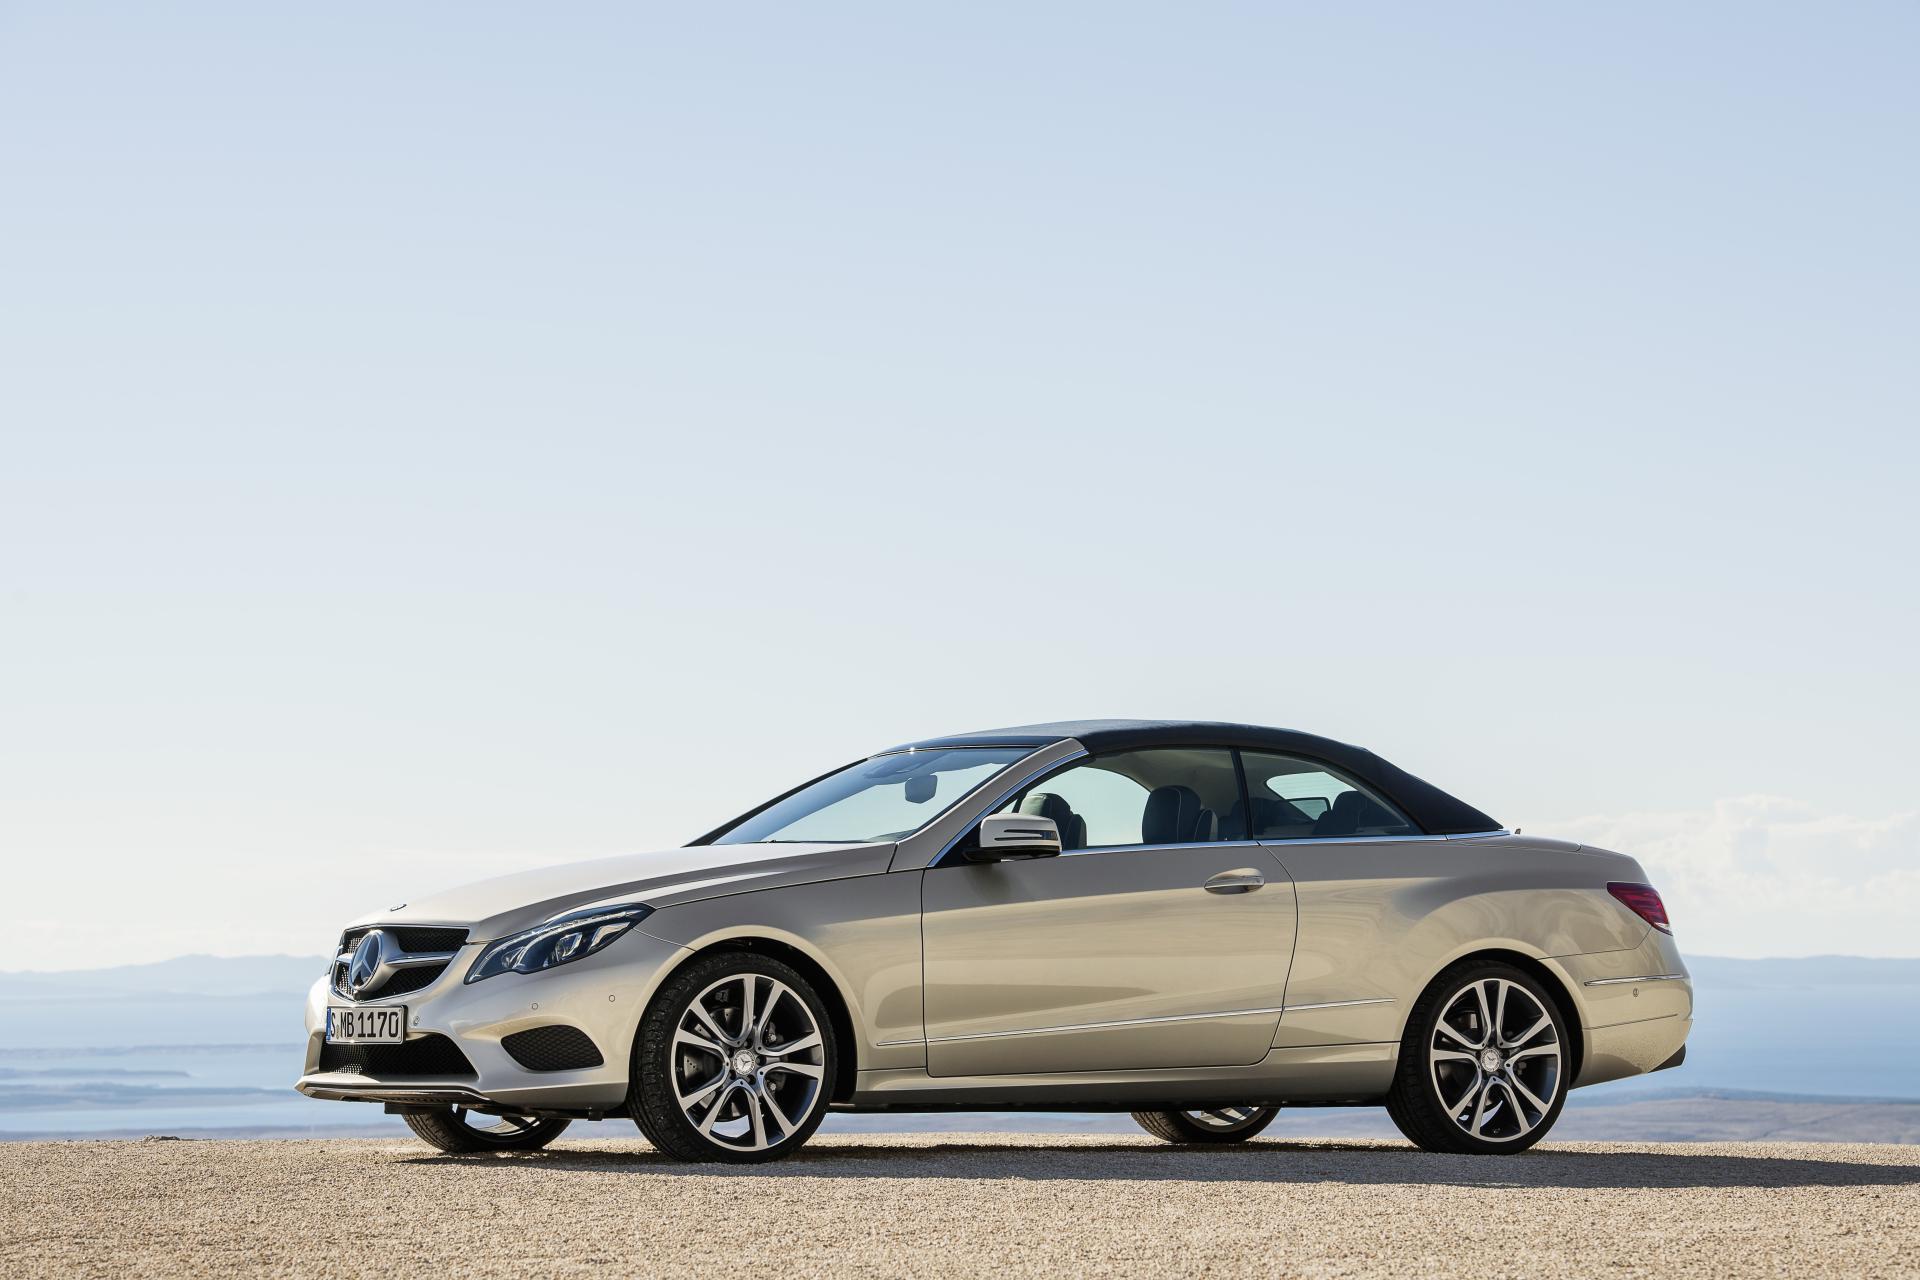 2014 mercedes benz e class cabriolet technical for Mercedes benz e class dimensions